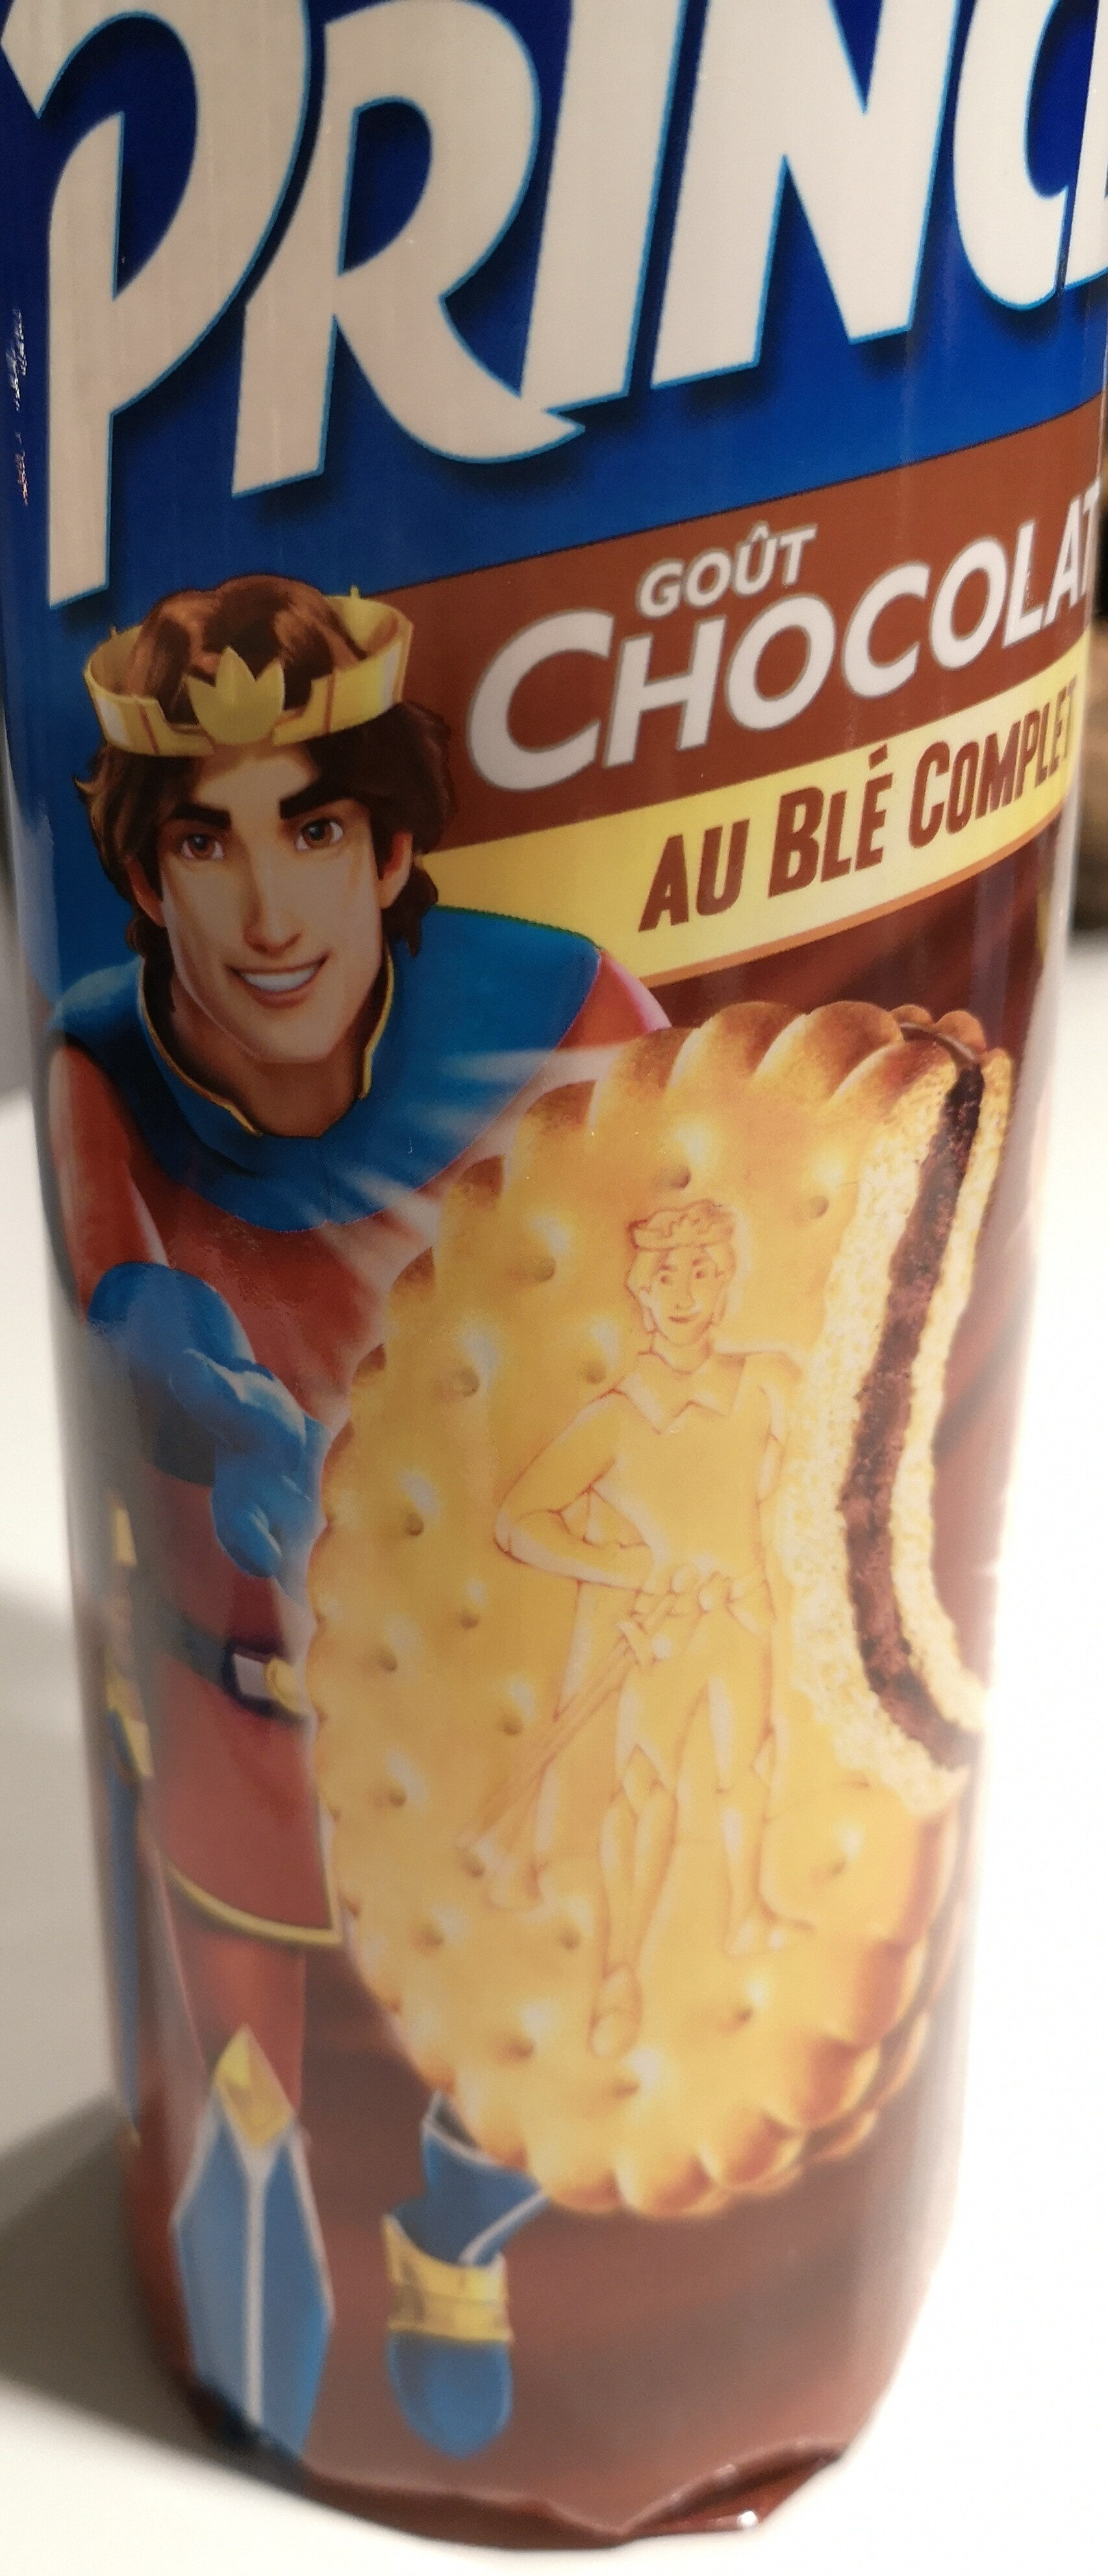 Prince Chocolat blé complet - Product - fr